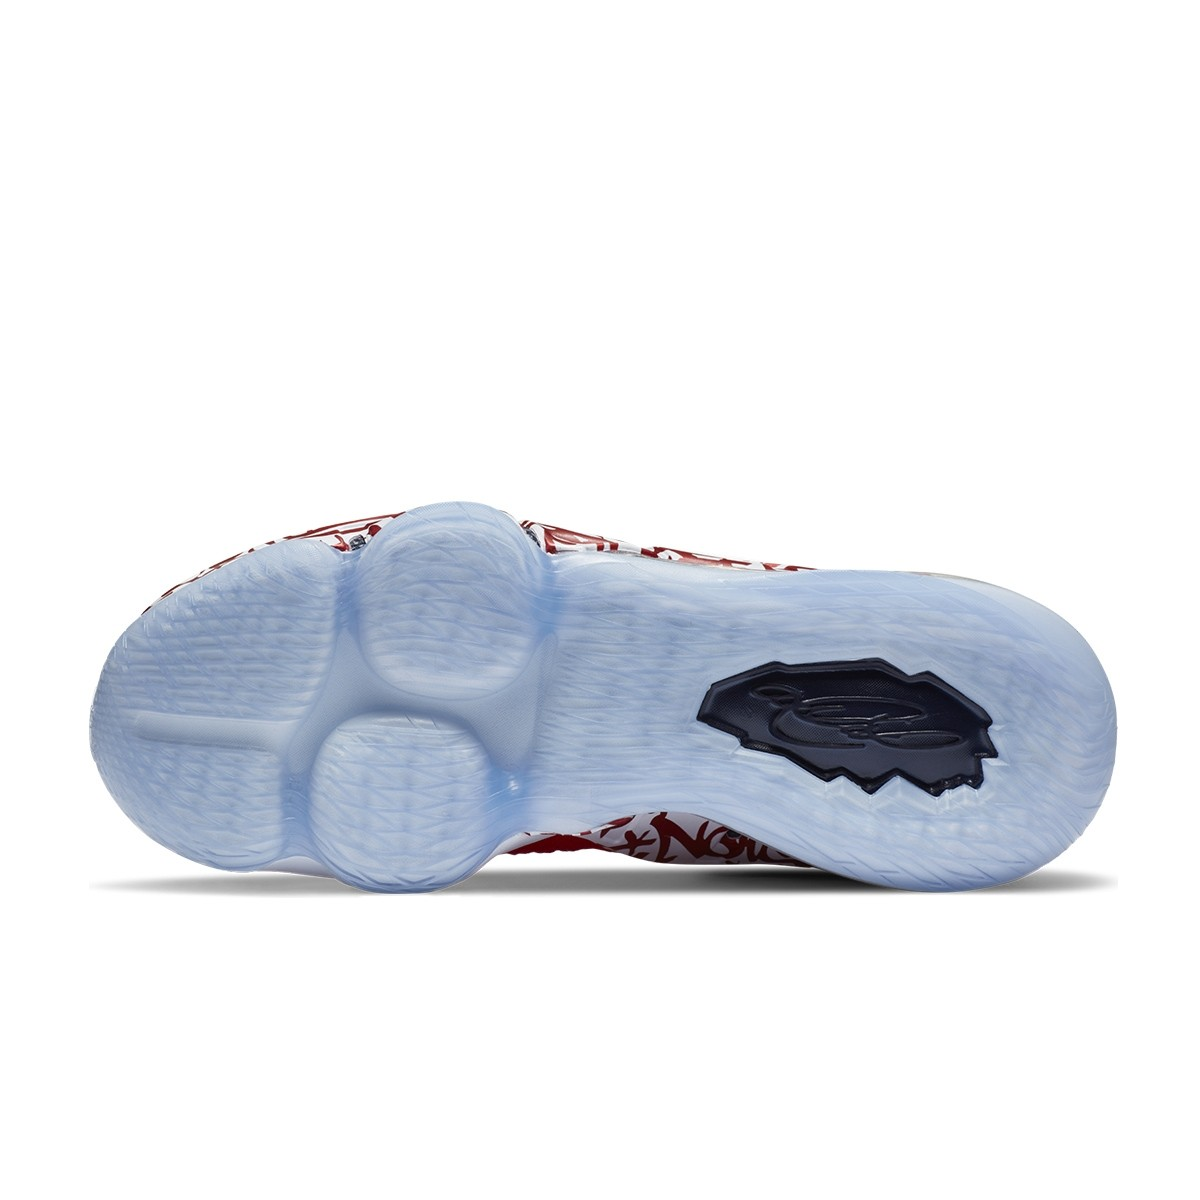 Nike Lebron XVII FP 'Gaffiti Remix Red'-CT6047-600